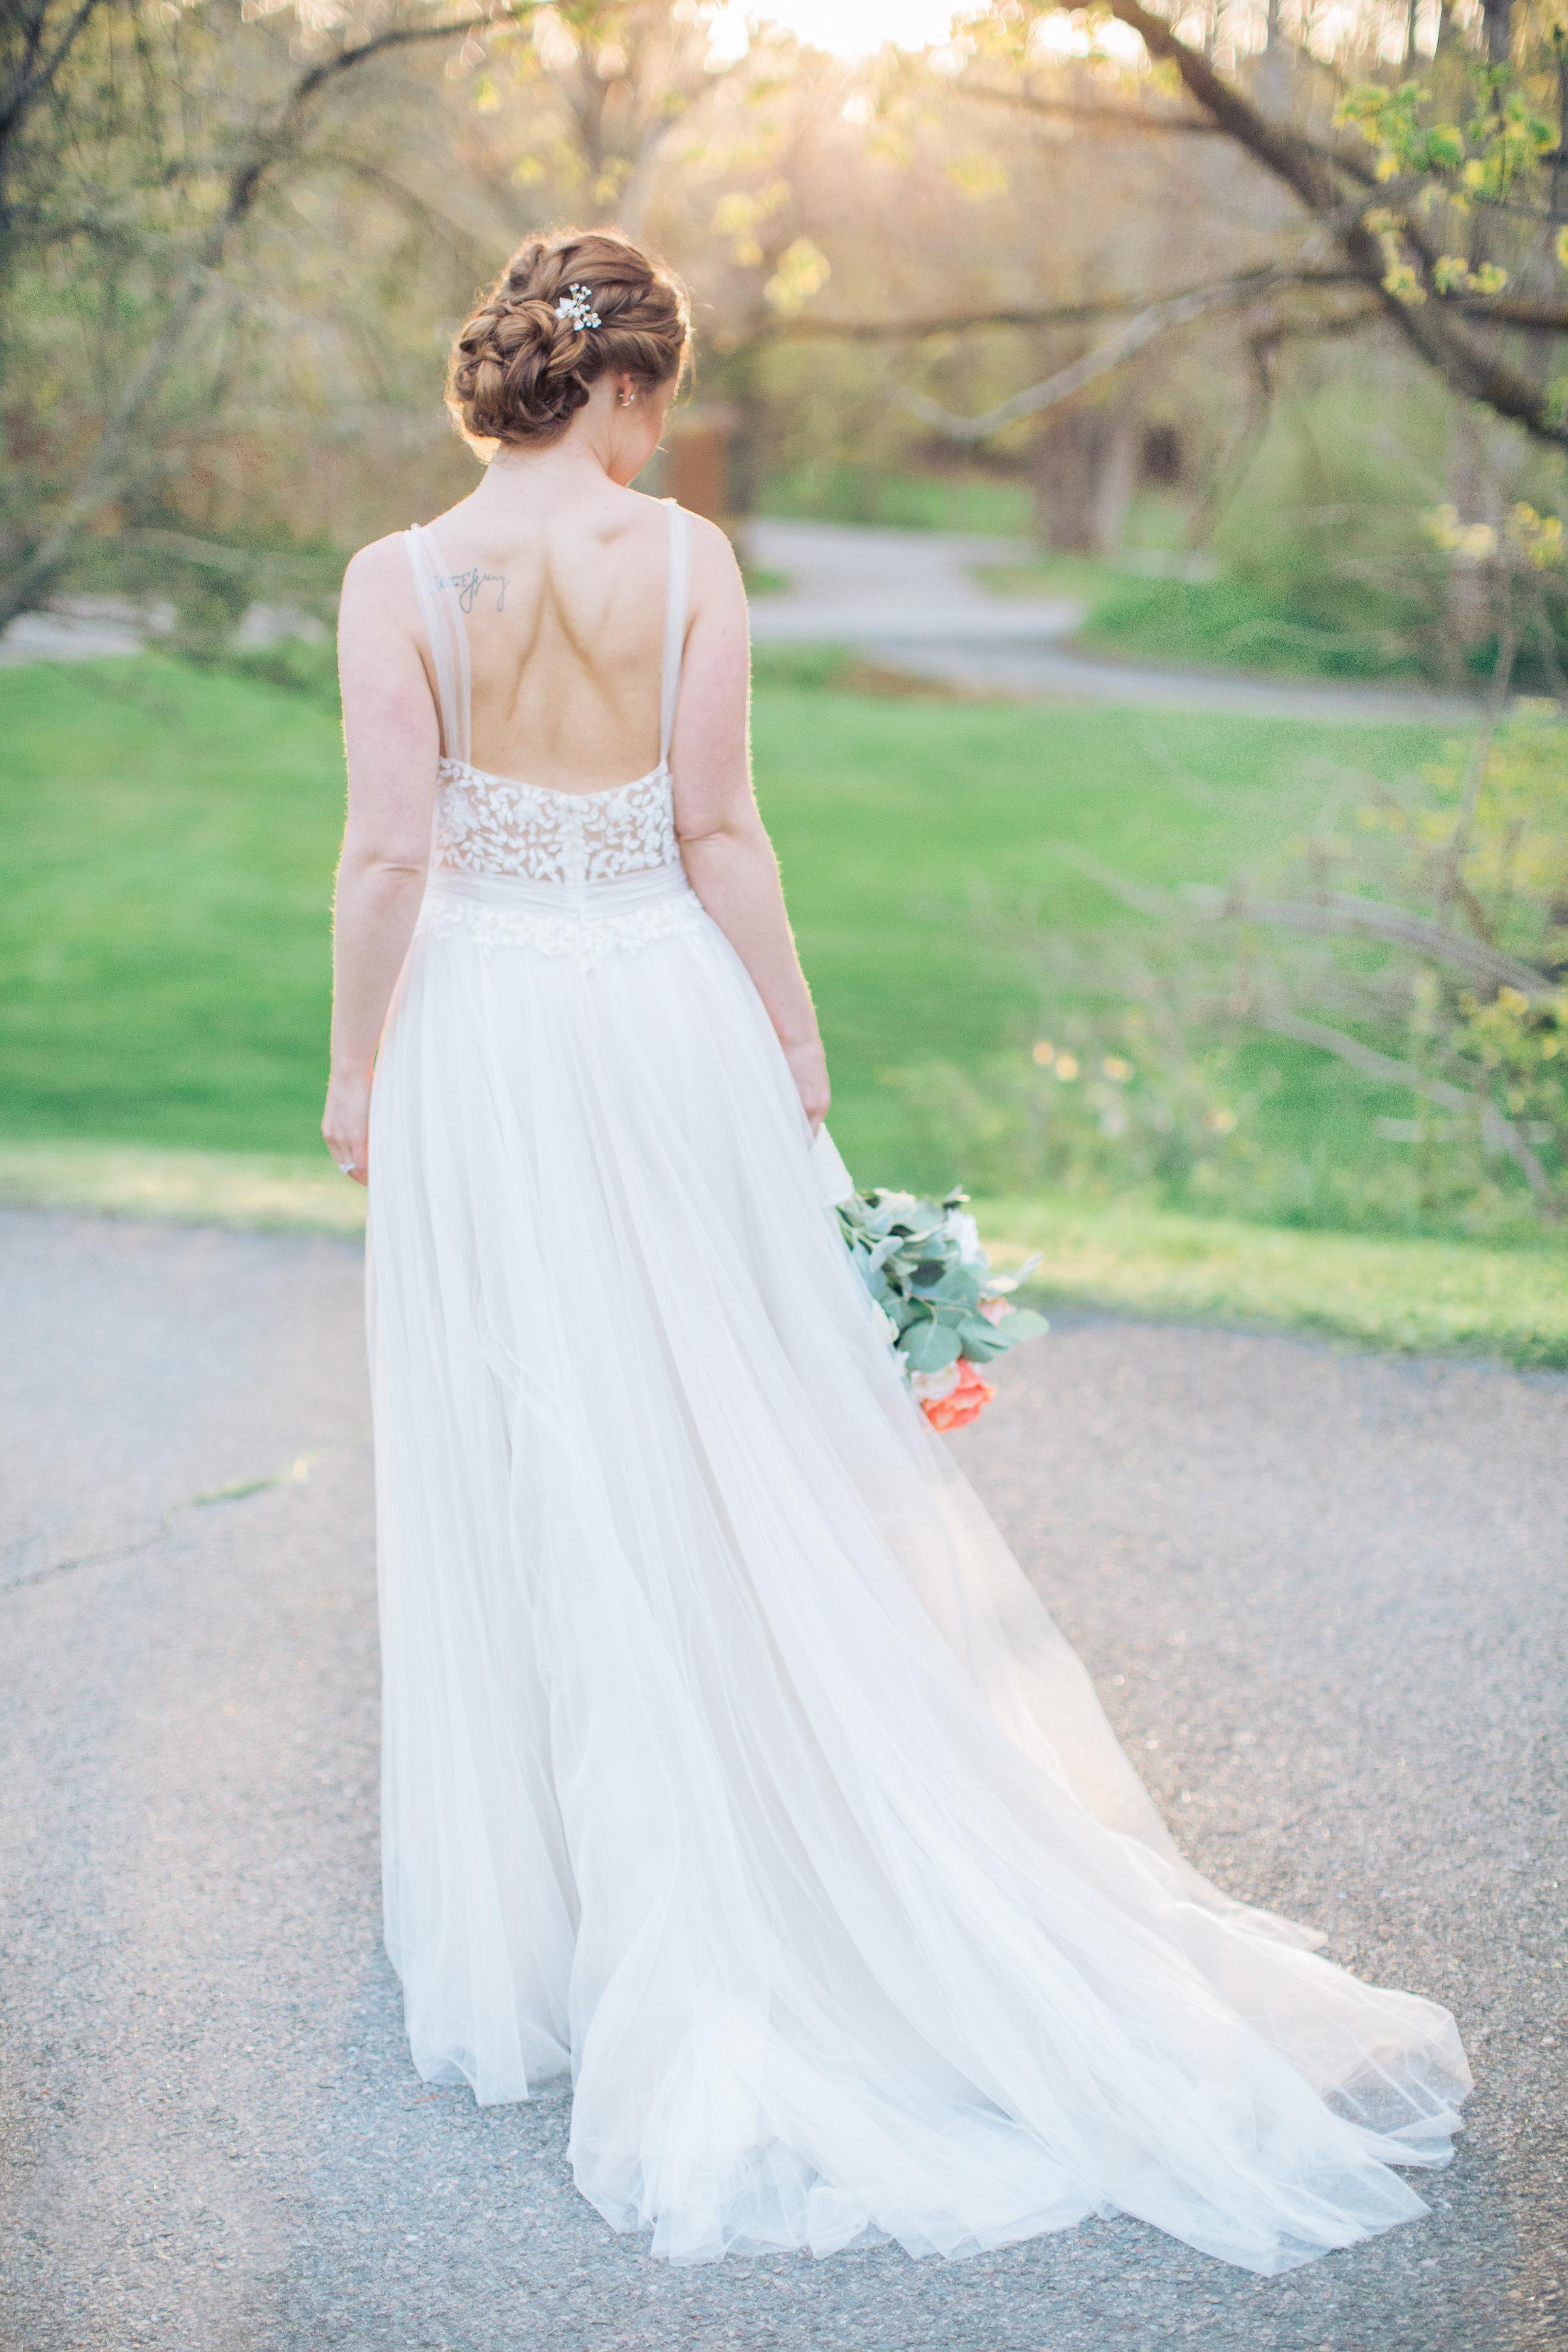 spring-wedding-overbrook-house-boston-cape-cod-wedding-photographer-photo-6340.jpg